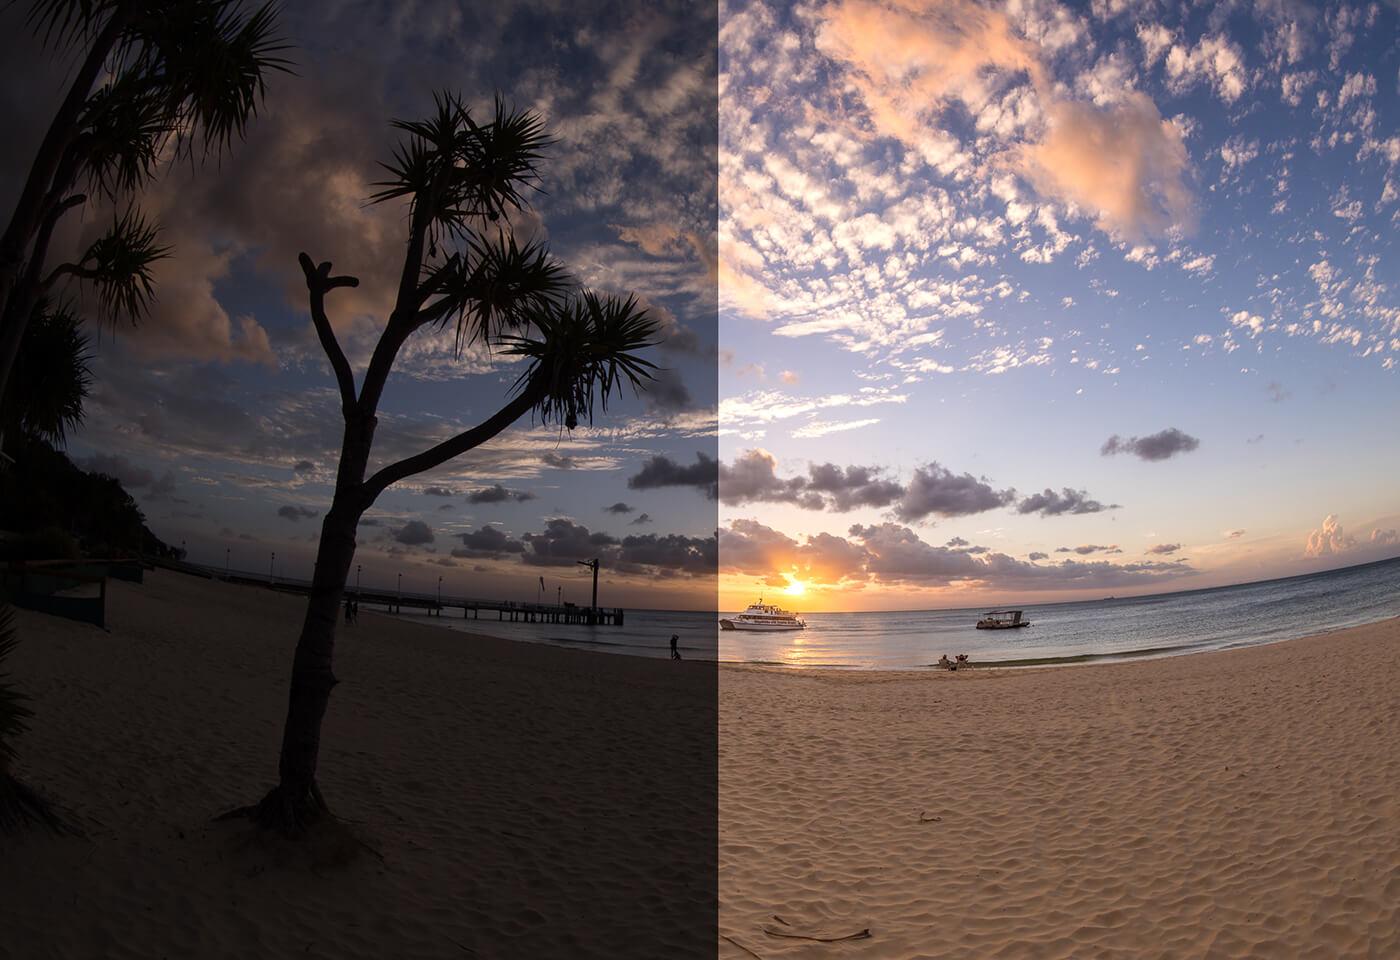 Beach photo edited with Lightroom